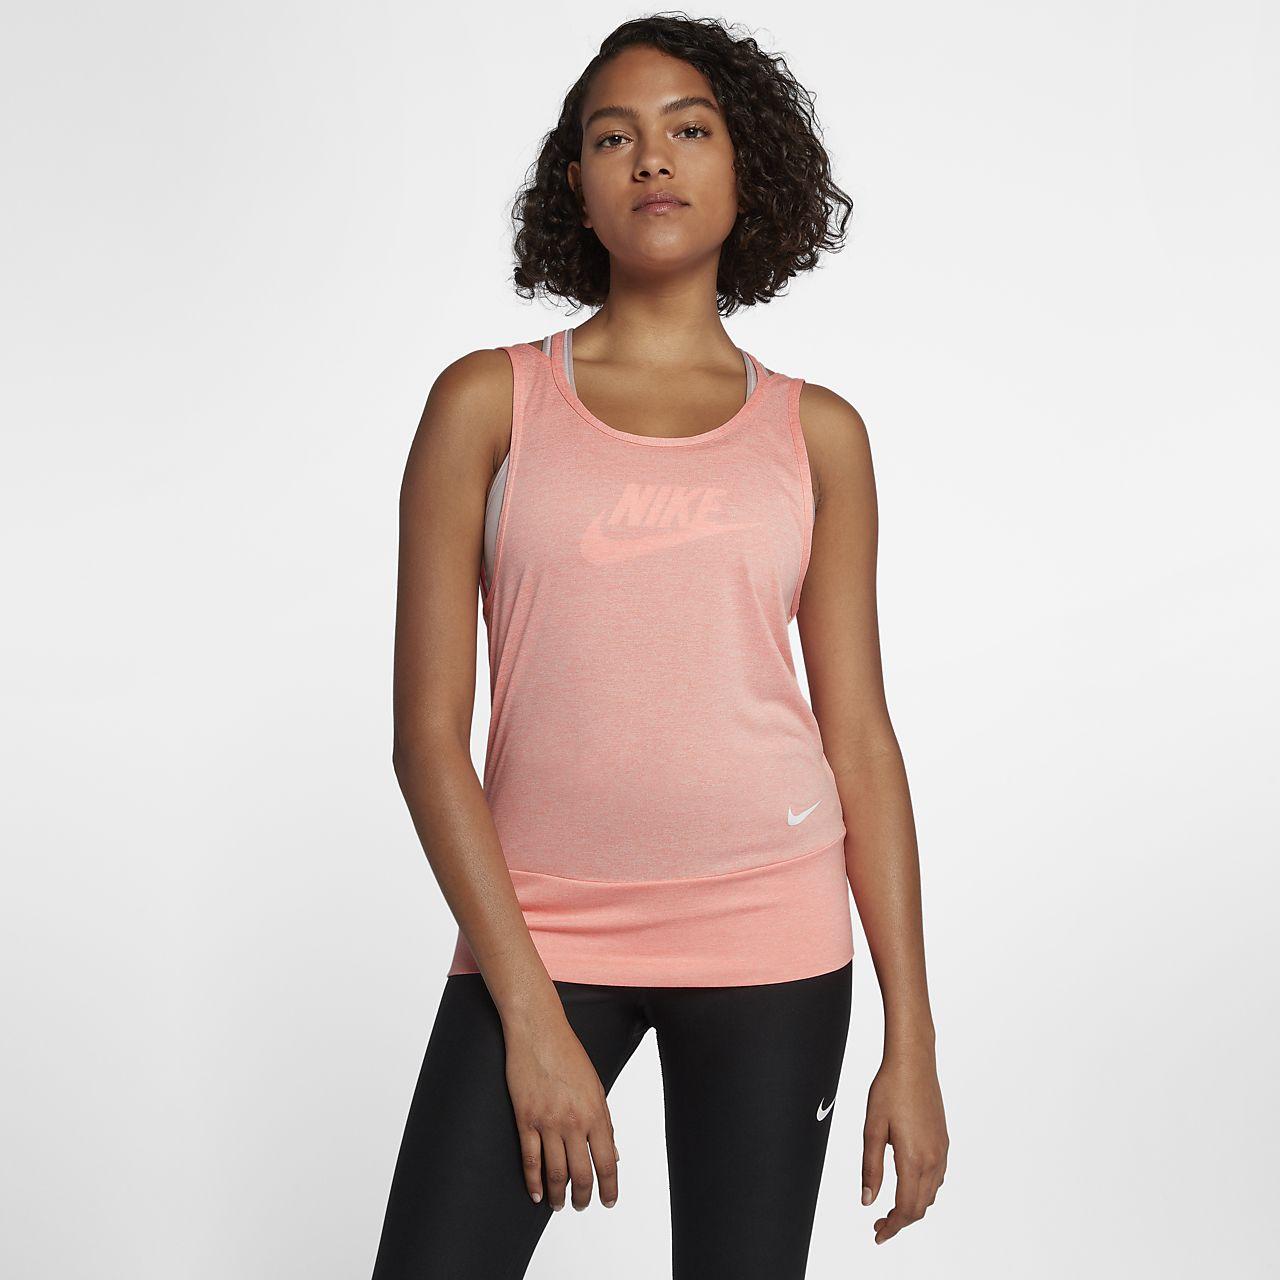 ... Nike Dri-FIT Women's Training Tank Top